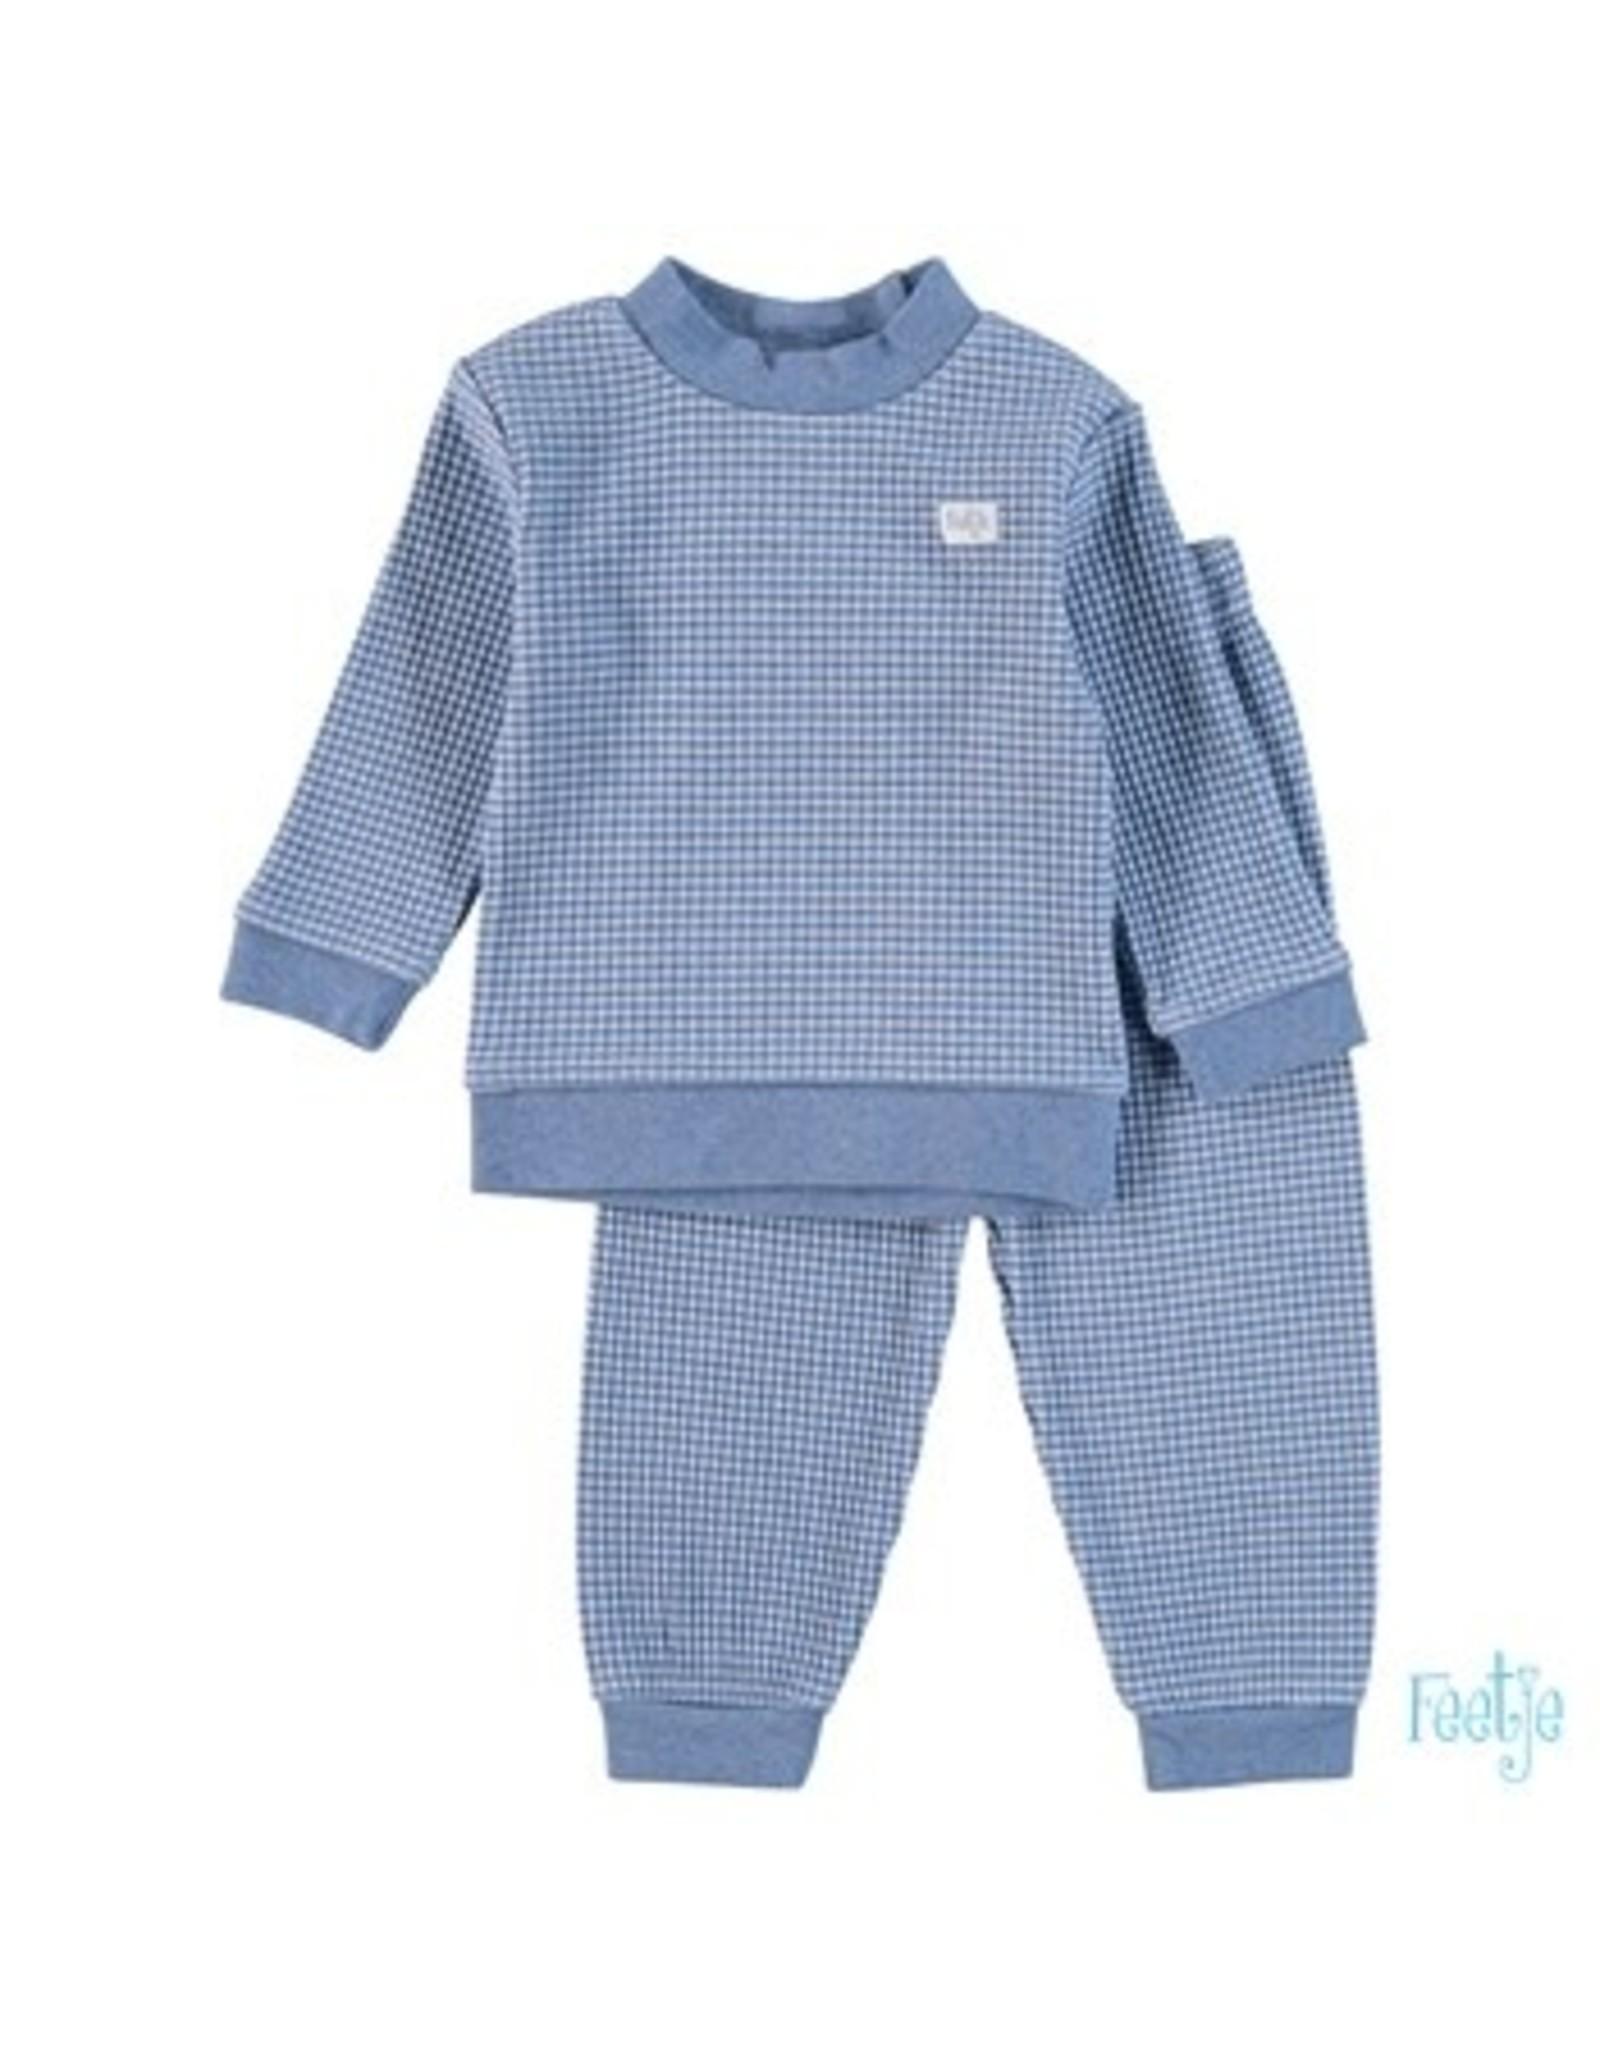 Feetje Pyjama Blauw baby